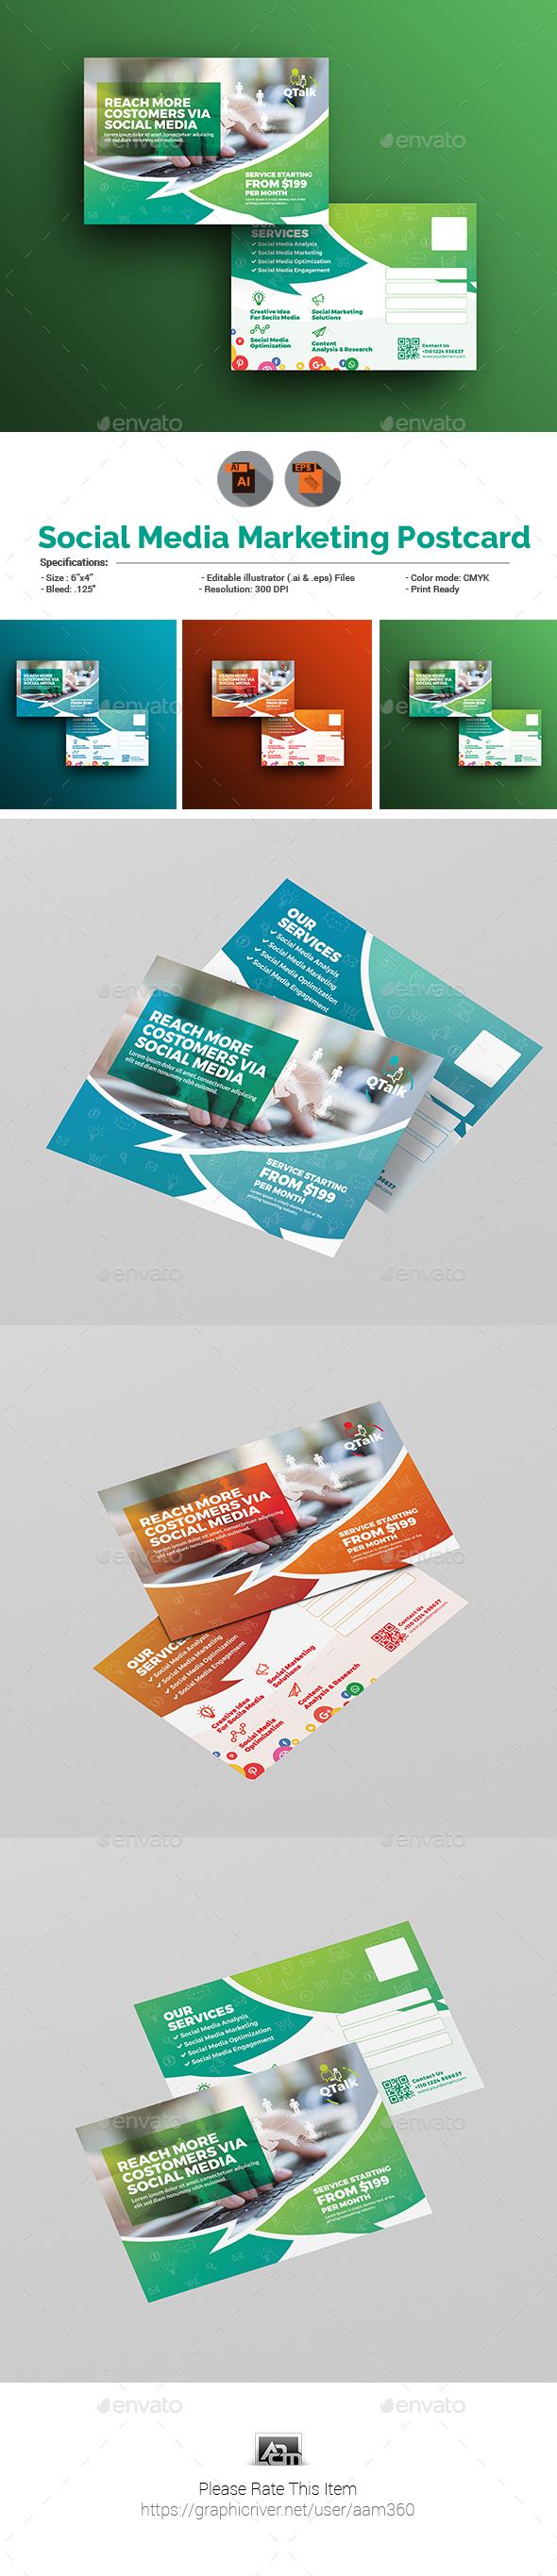 Social Media Marketing Postcard Template By Aam GraphicRiver - Marketing postcards templates